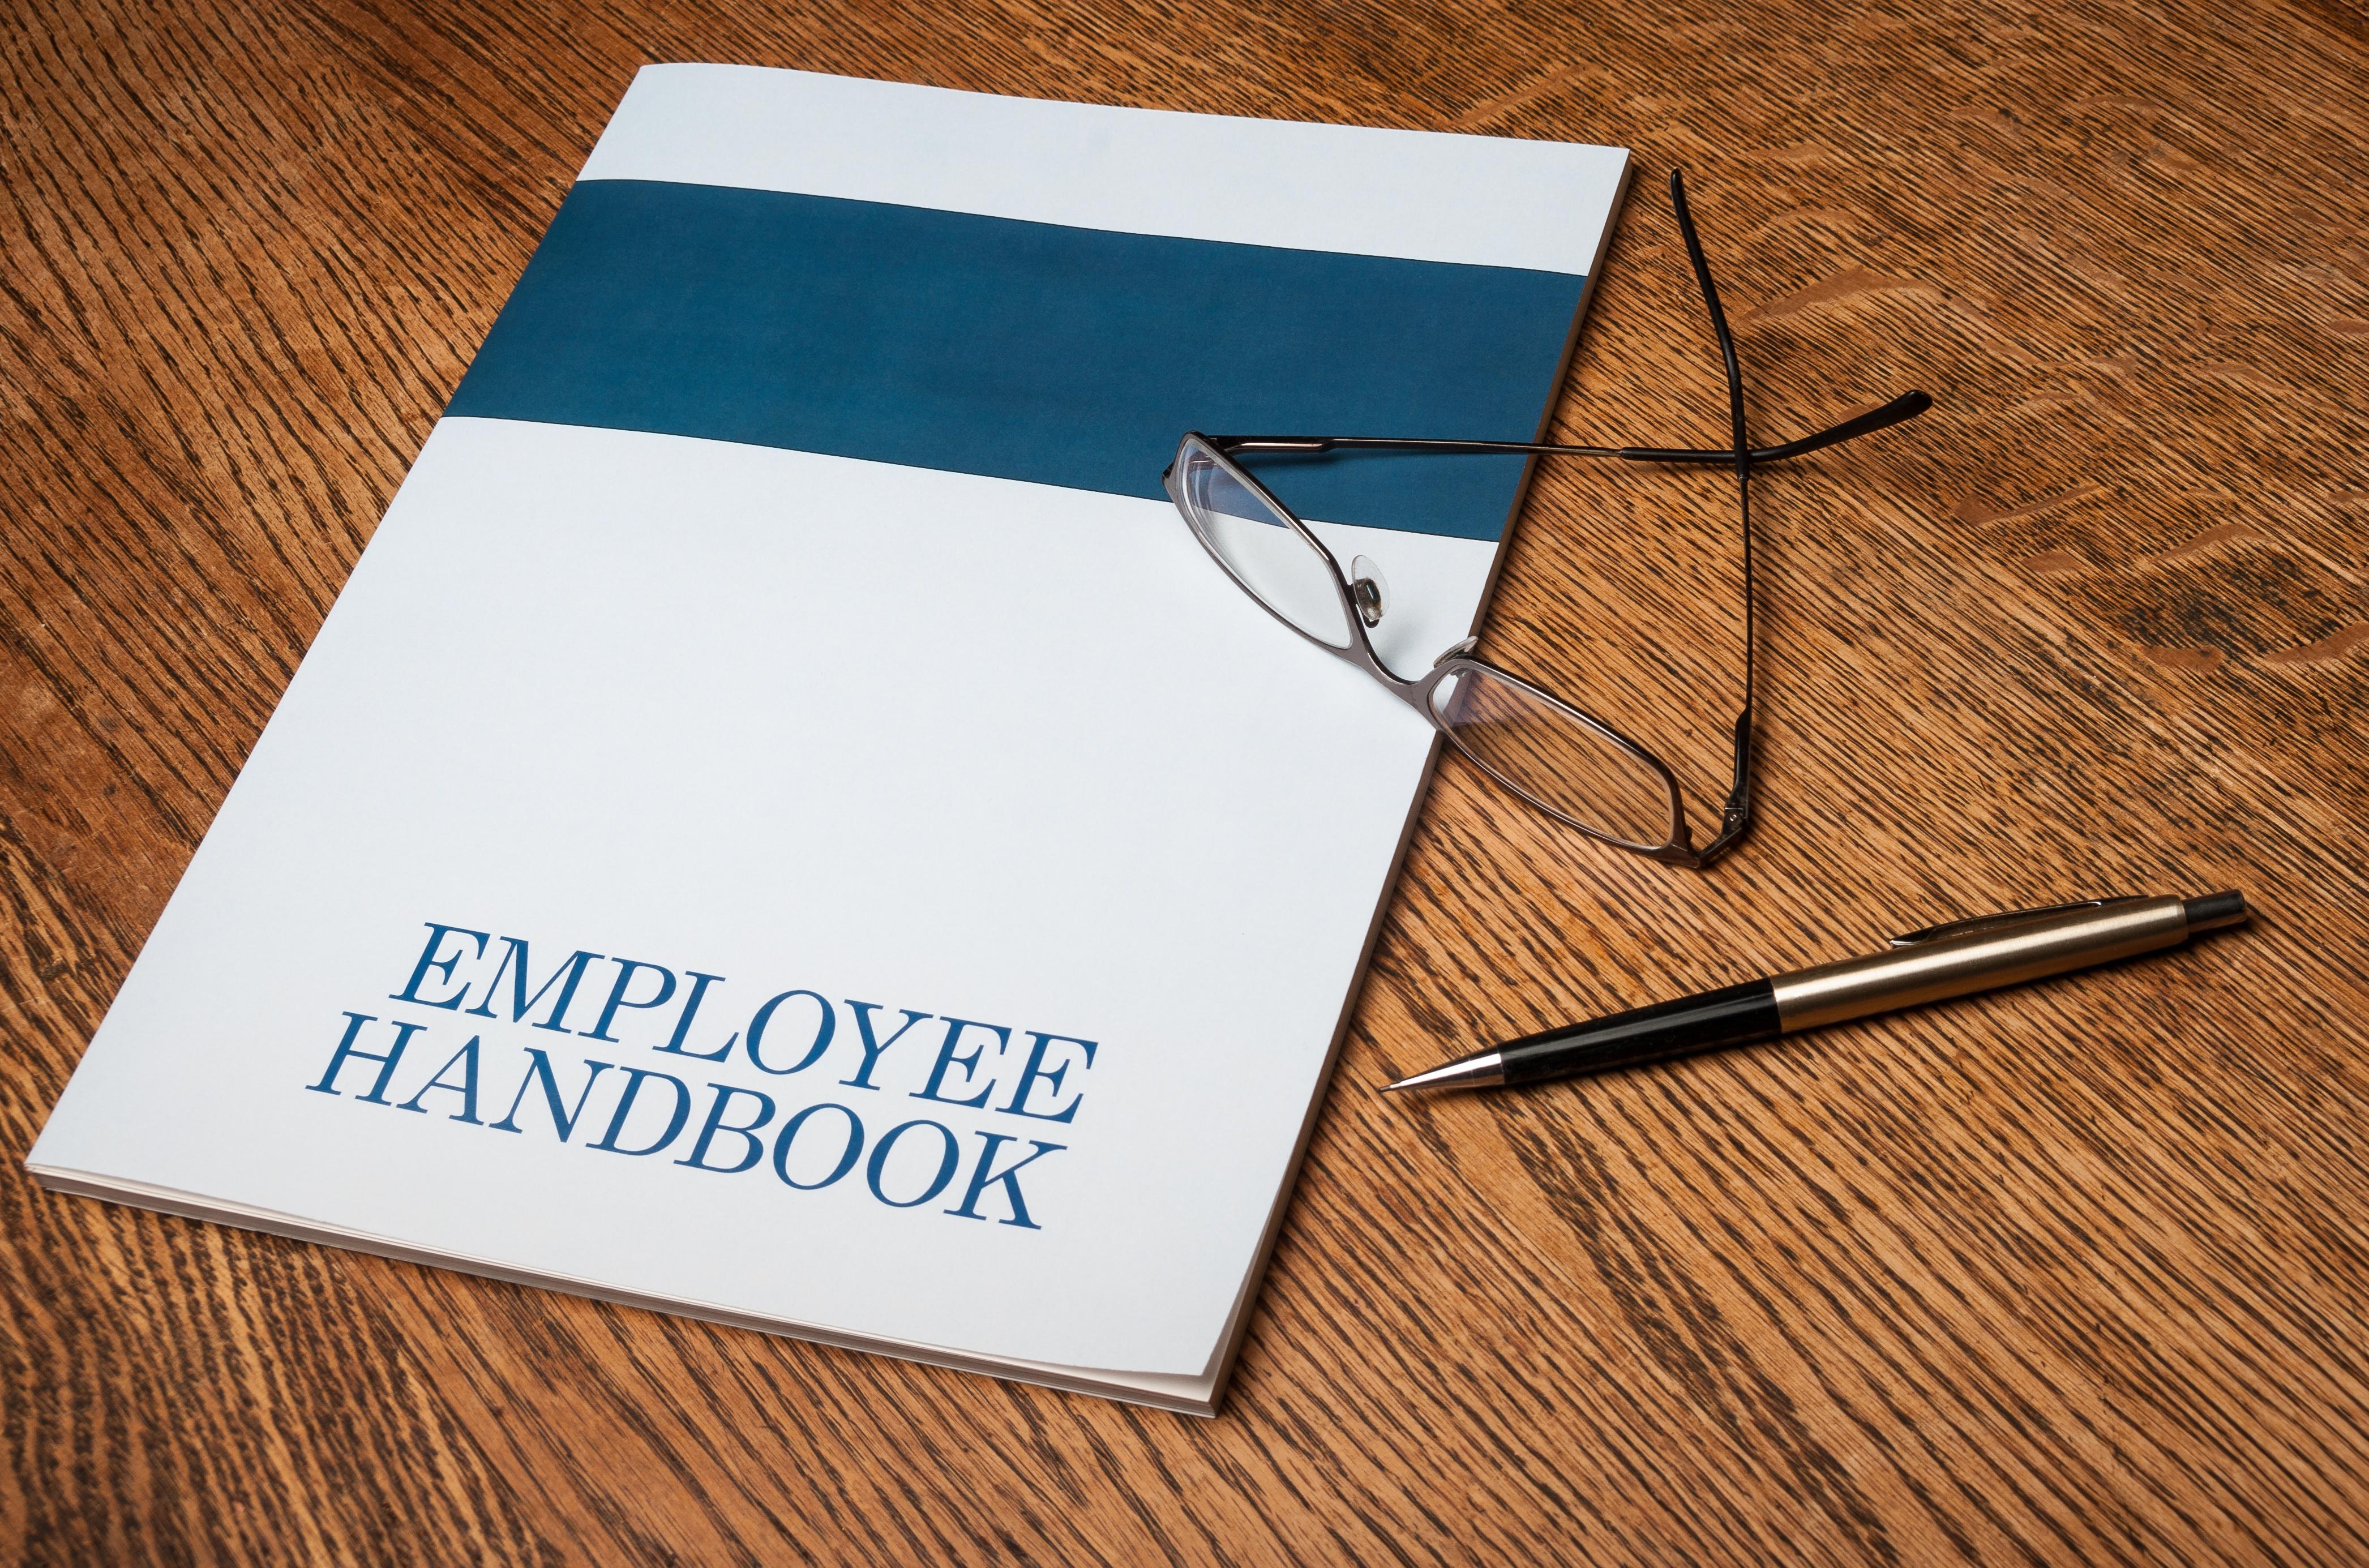 How do I write an employee handbook?